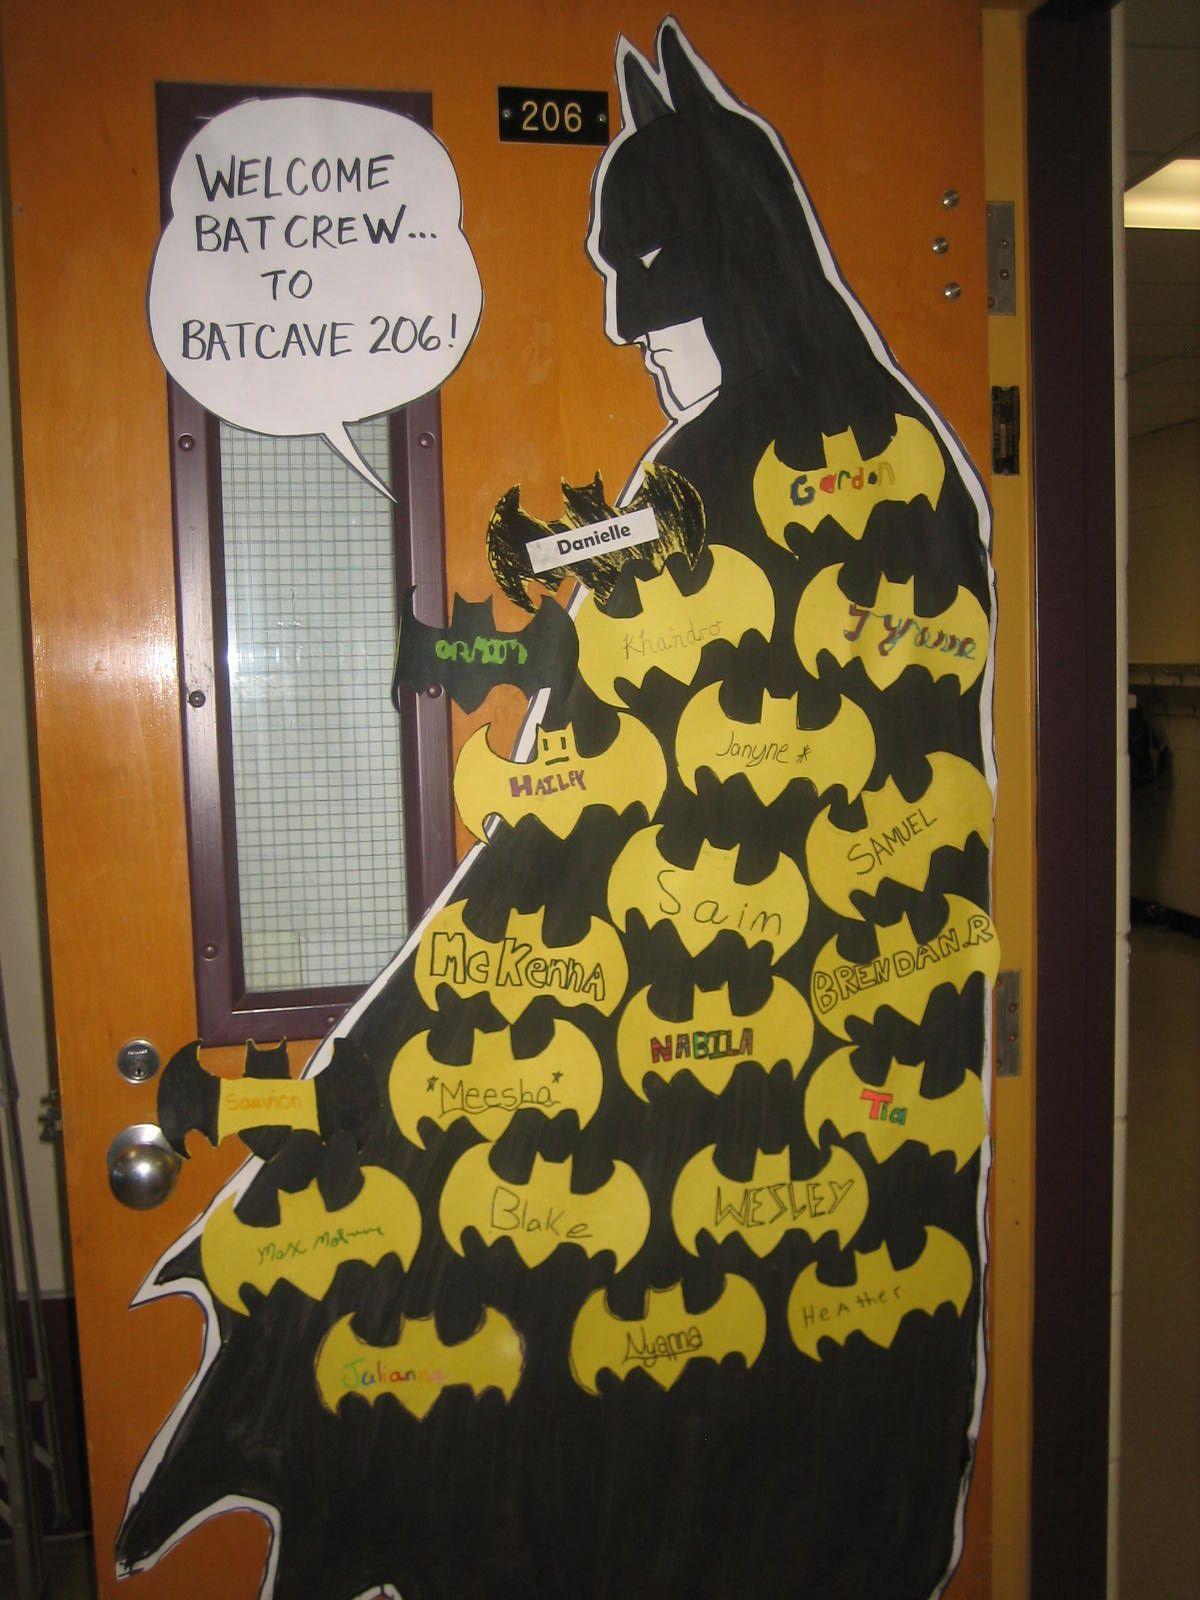 Bat Crew Of Room 206 Welcome To The Bat Crew S Blog